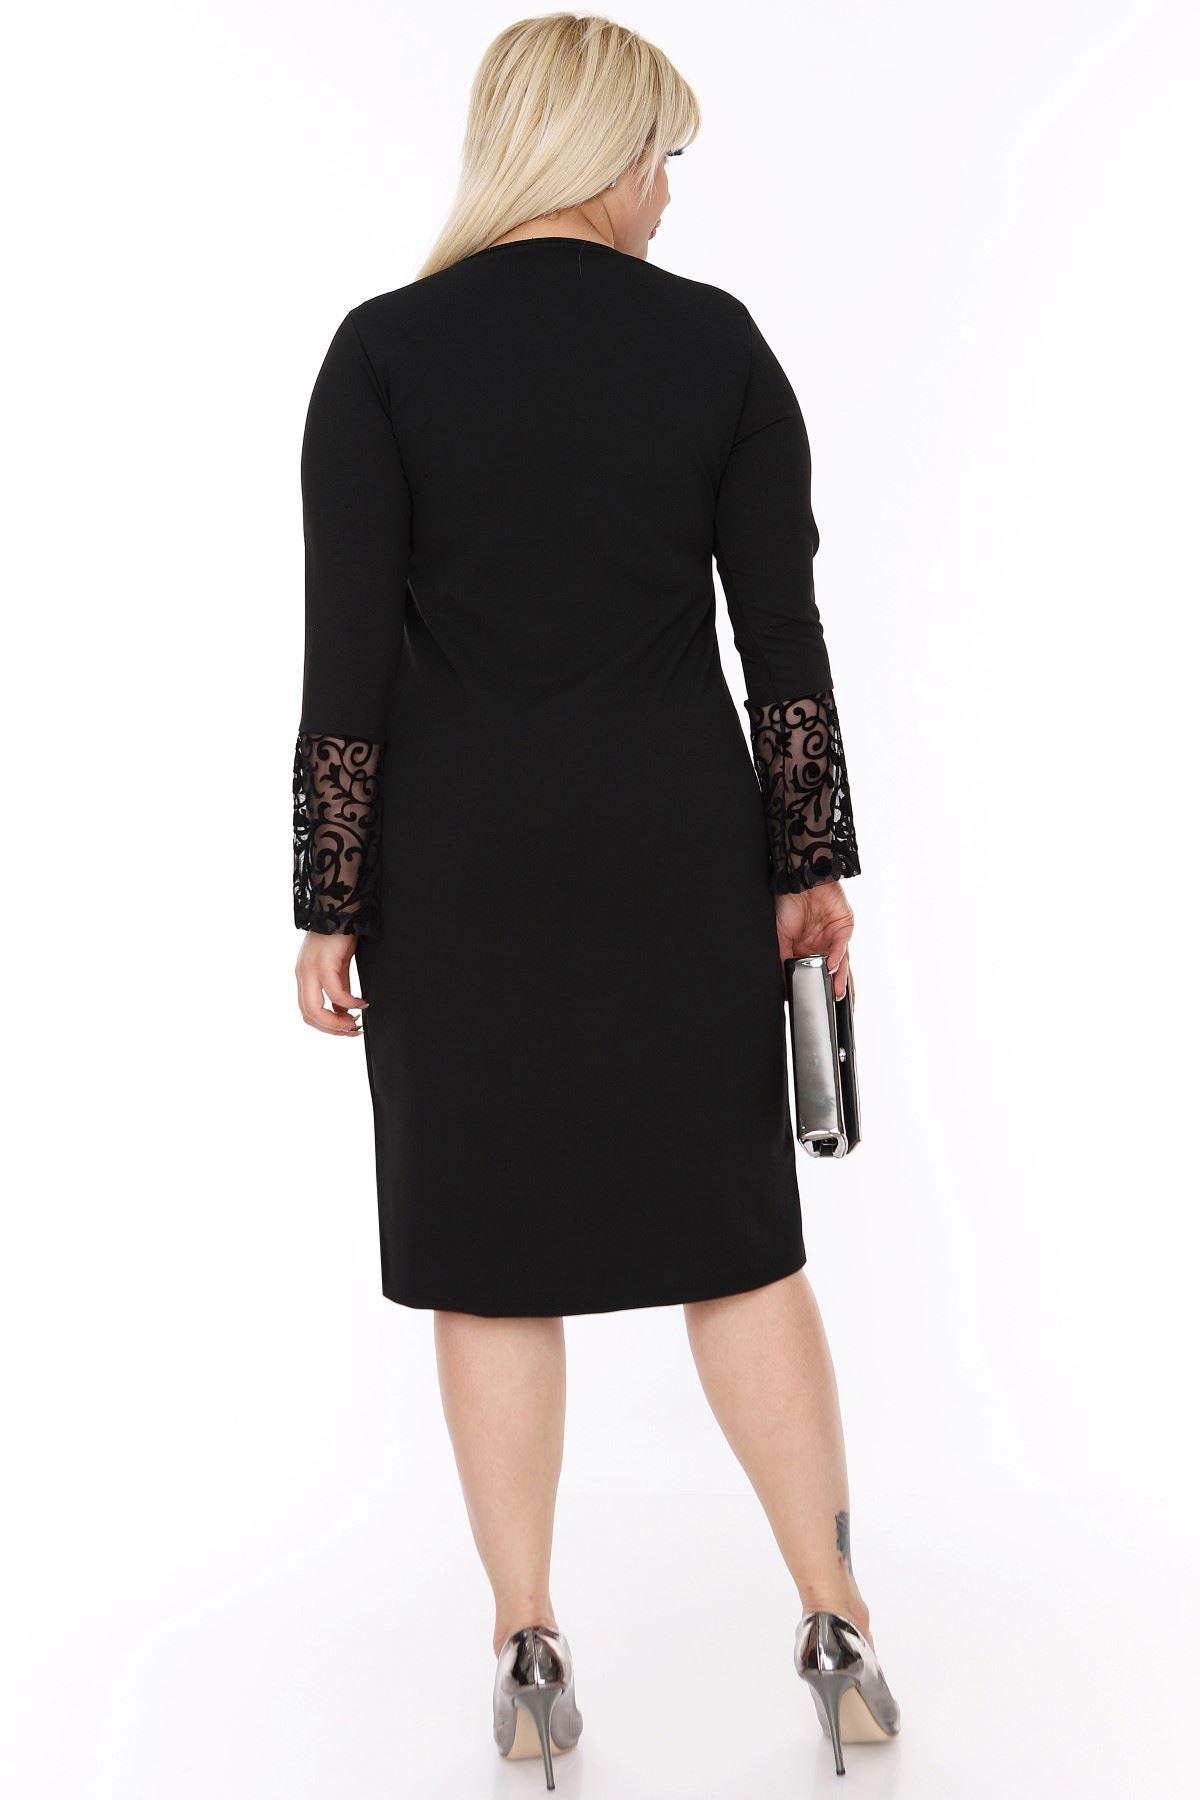 İspanyol Kol Siyah Büyük Beden Elbise 4D-69249